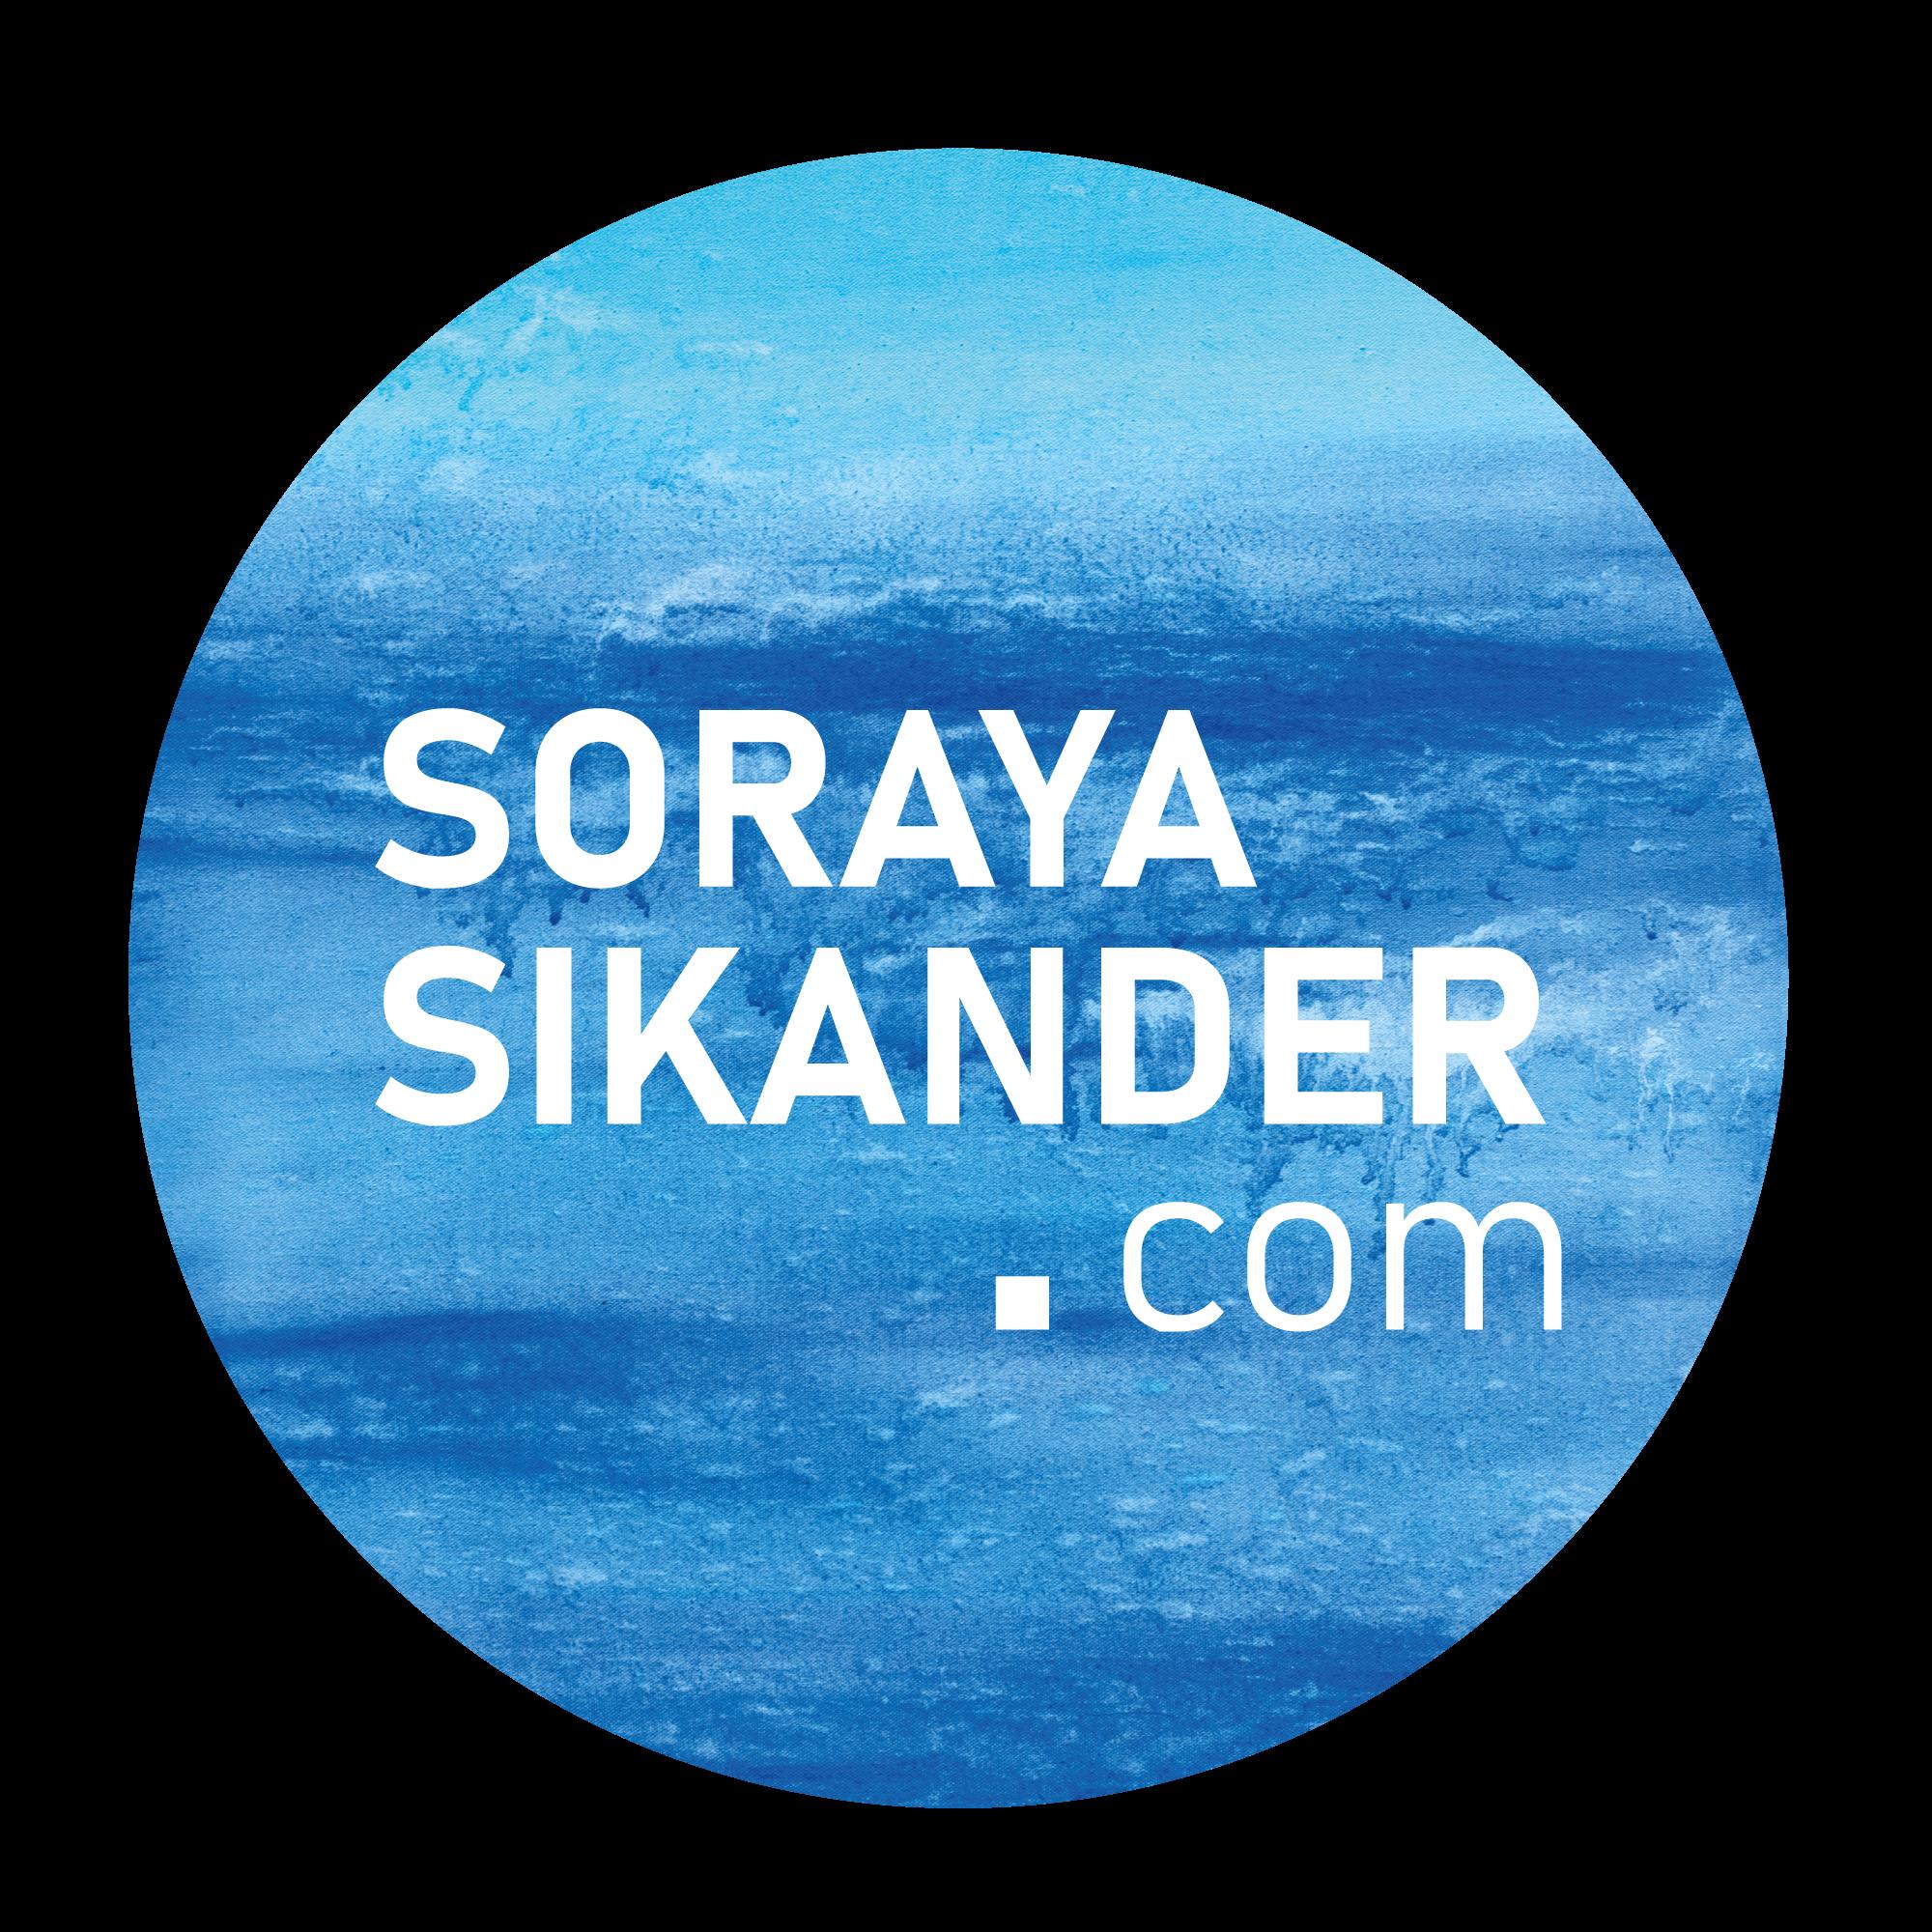 SORAYA SIKANDER